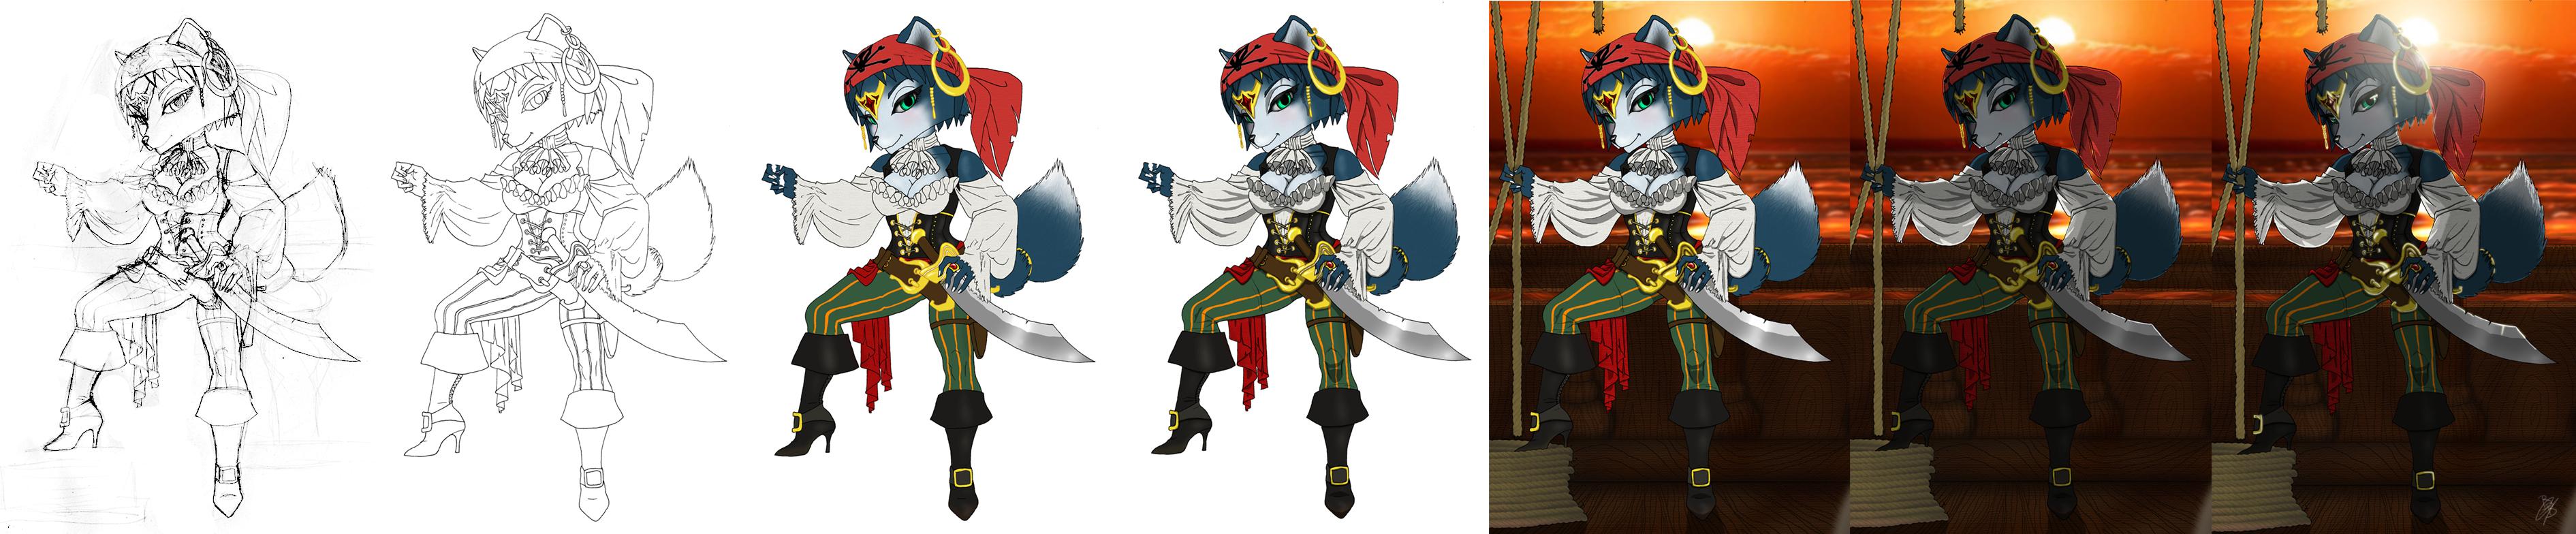 Krystal Pirate progress by BlackBy